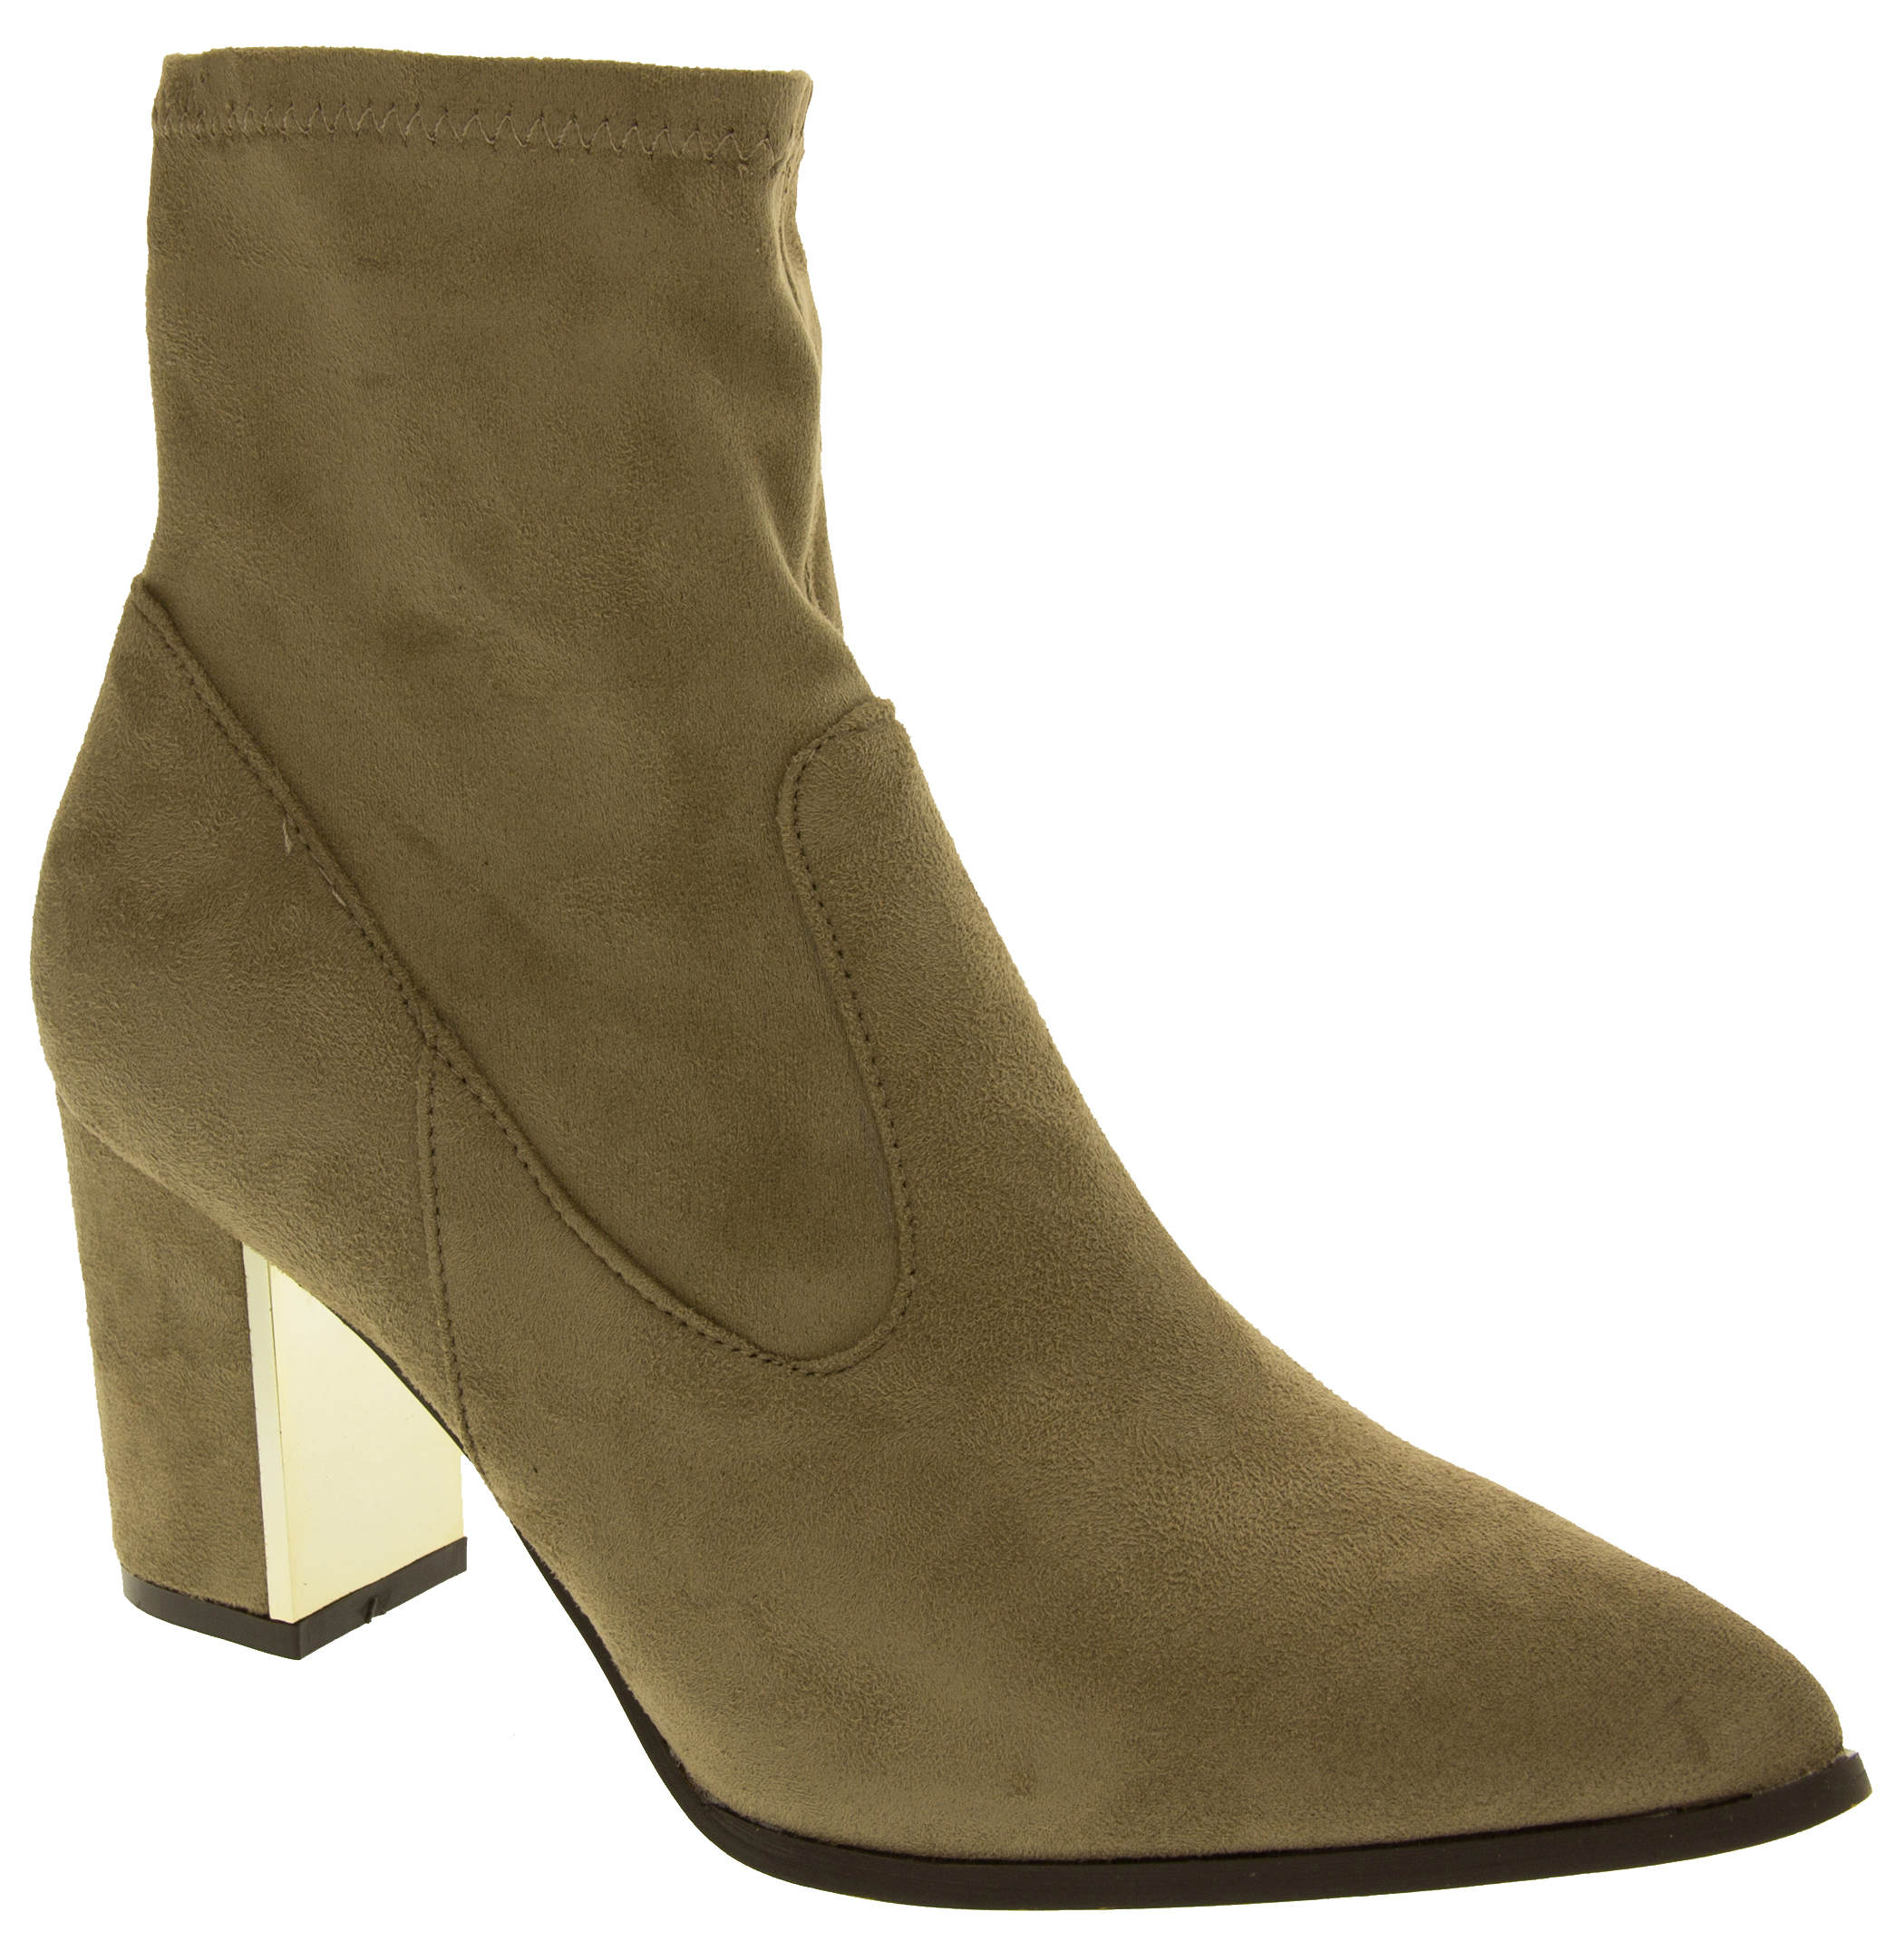 Womens Block Heel Ankle Boots Ladies Comfort Stretch Short ...